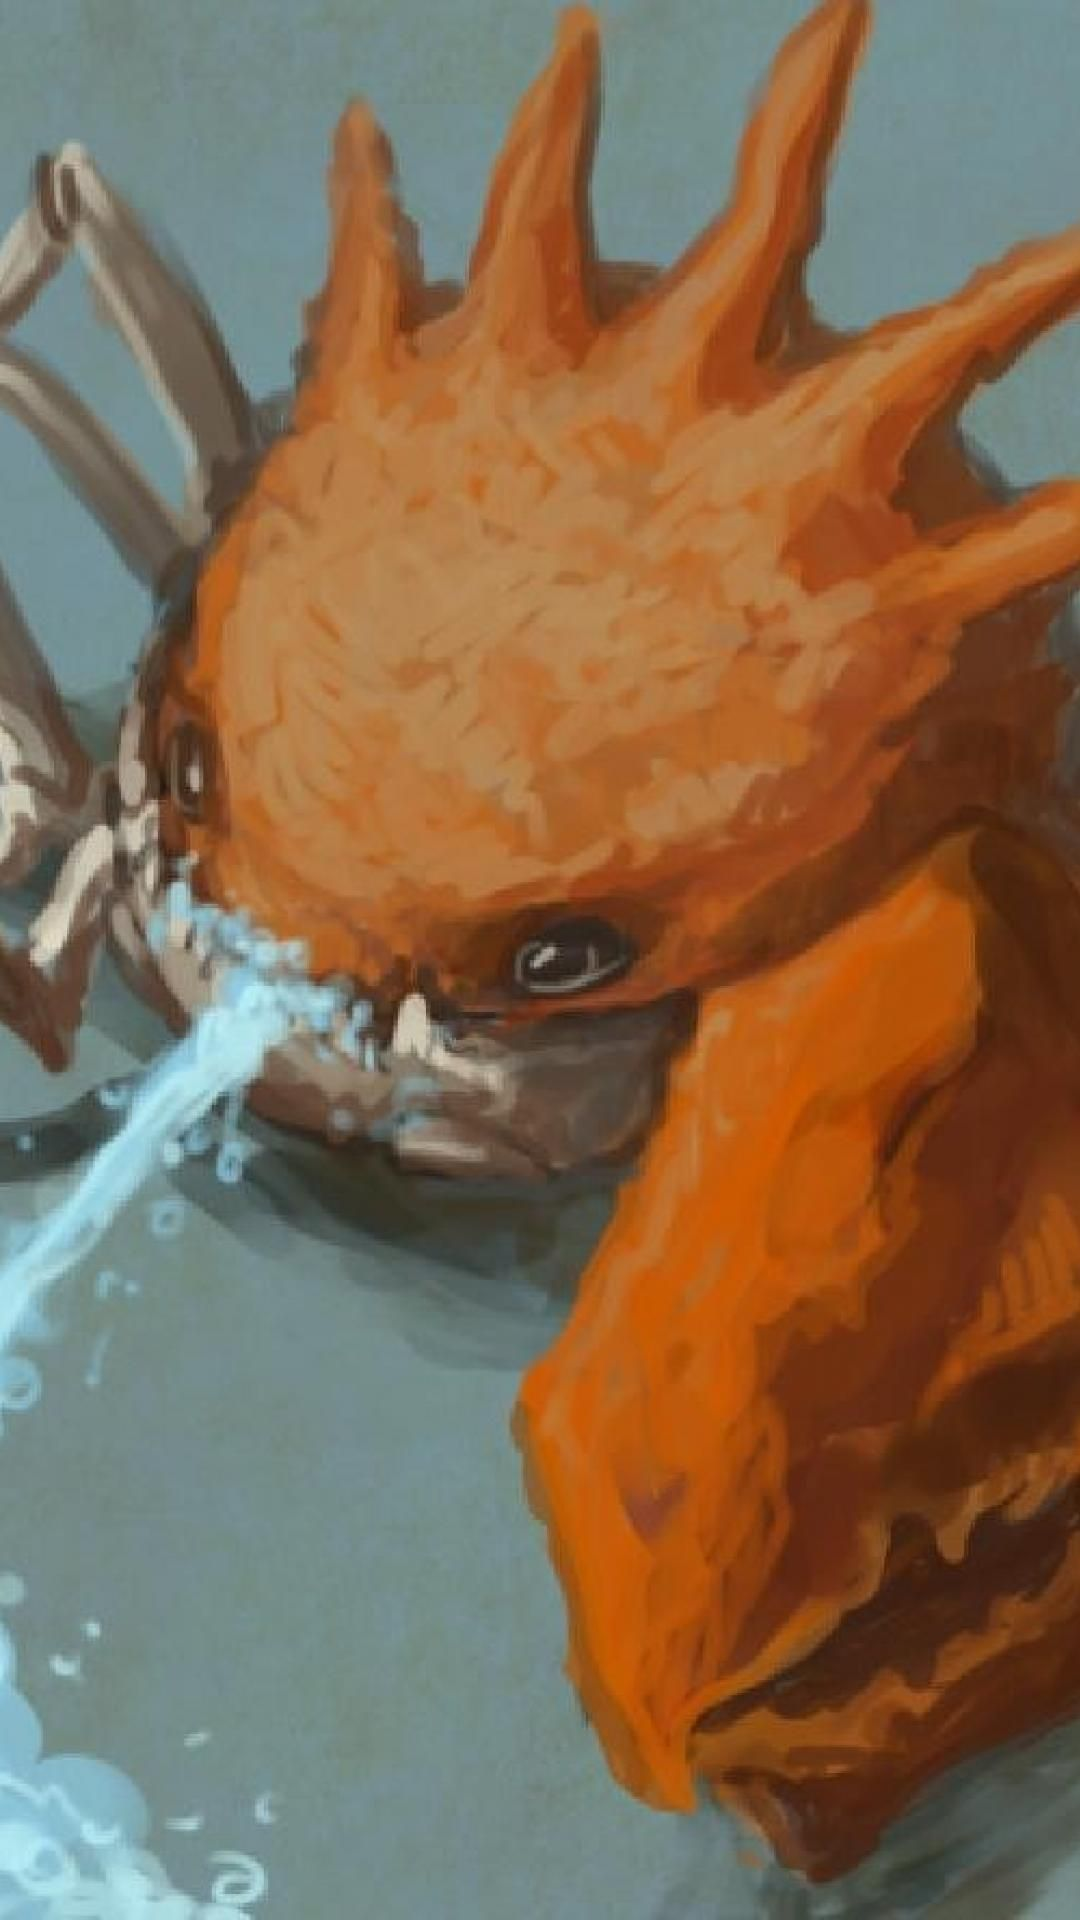 Water pokemon digital art artwork crabs kingler wallpaper | (102865)